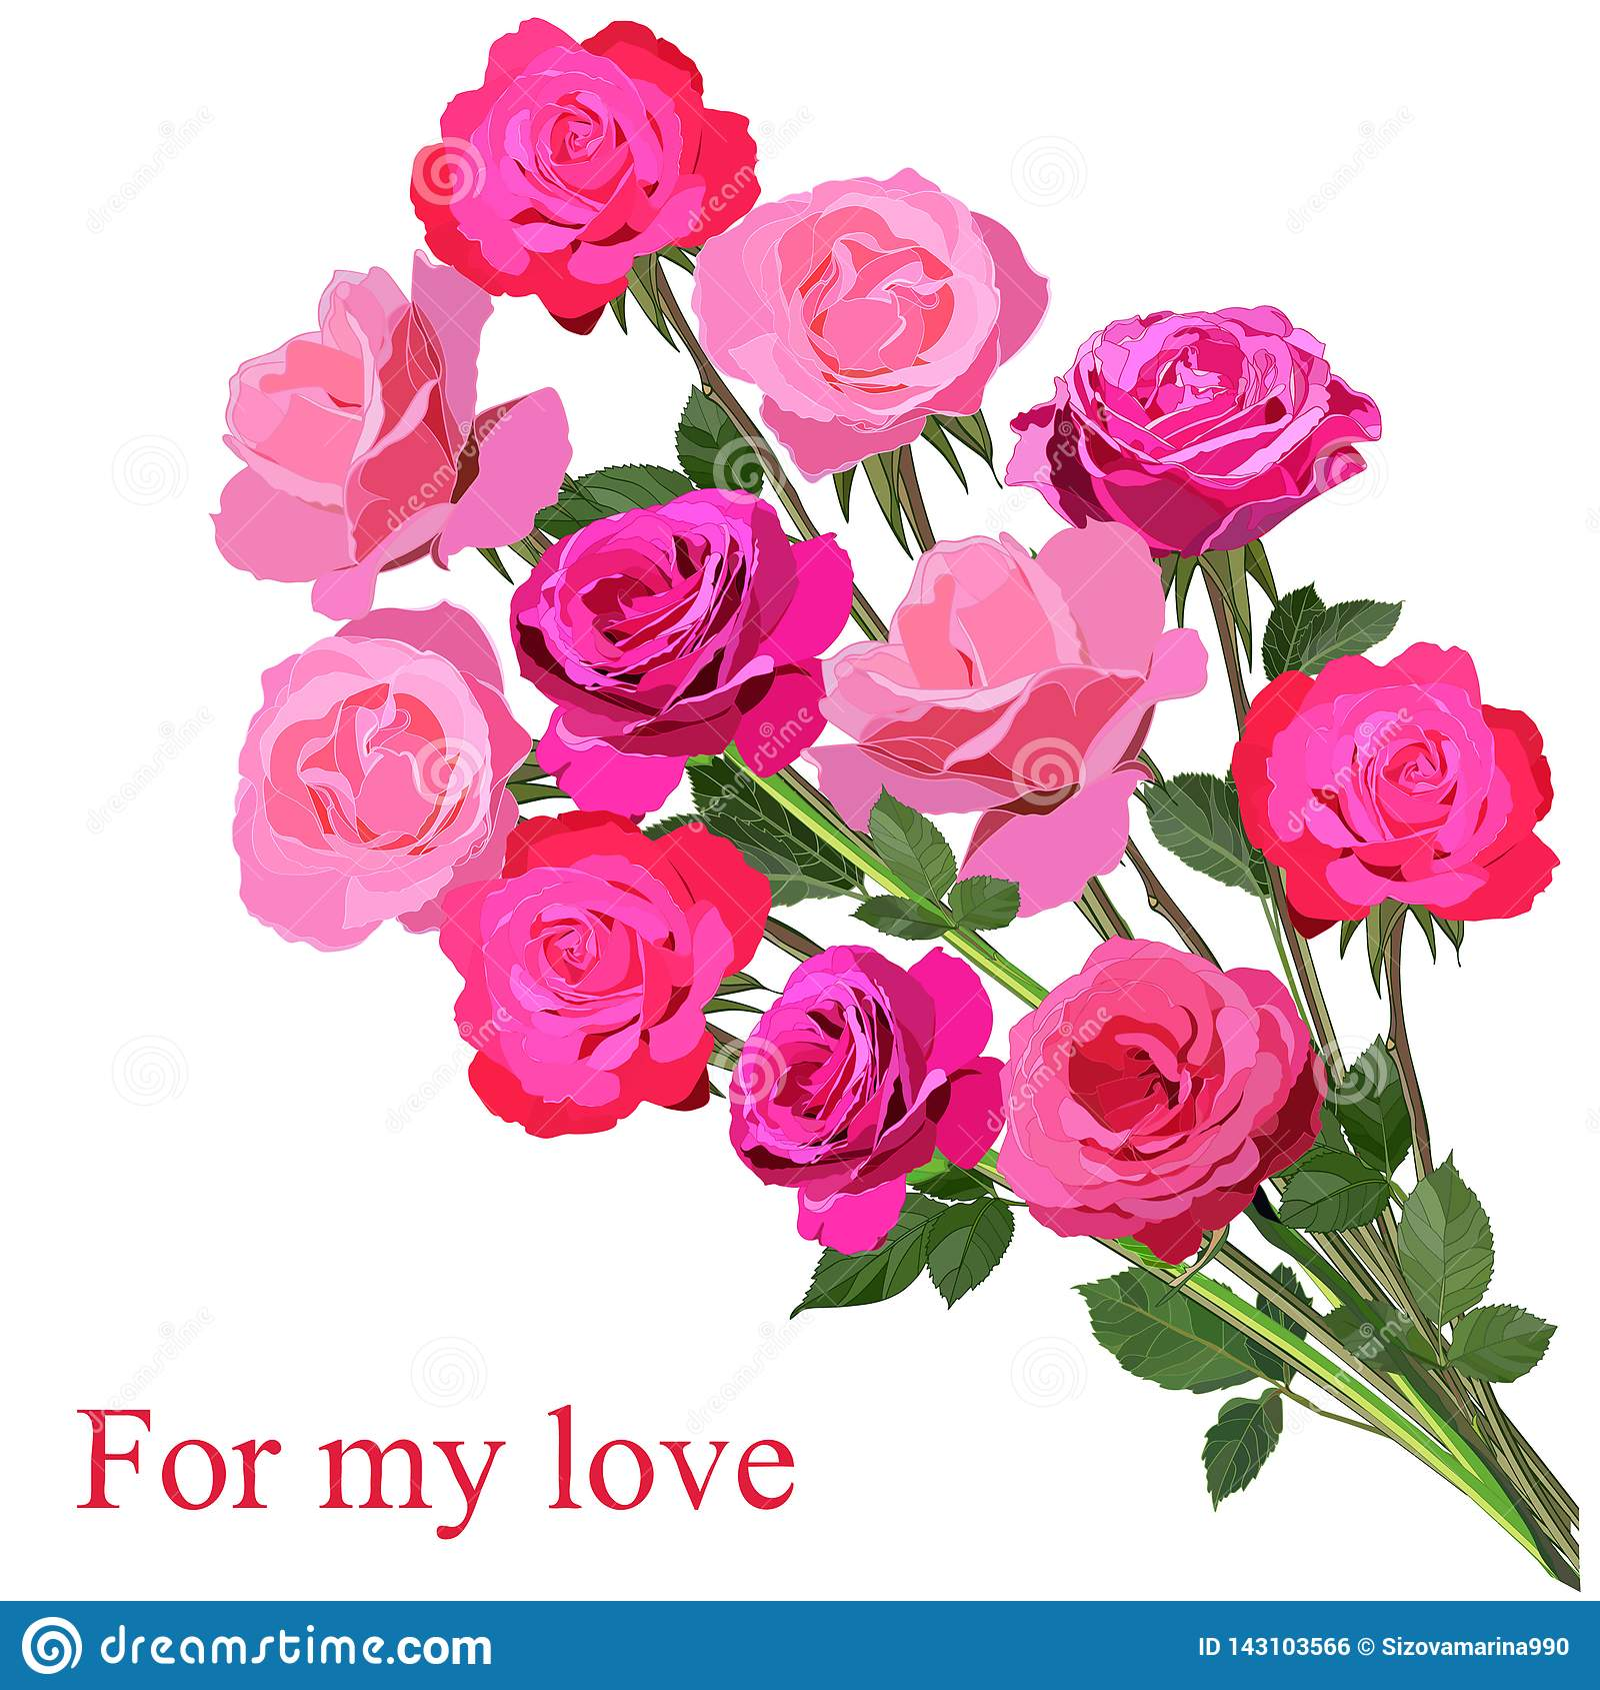 Stor bukett av ljusa rosa rosor som isoleras på vit bakgrund